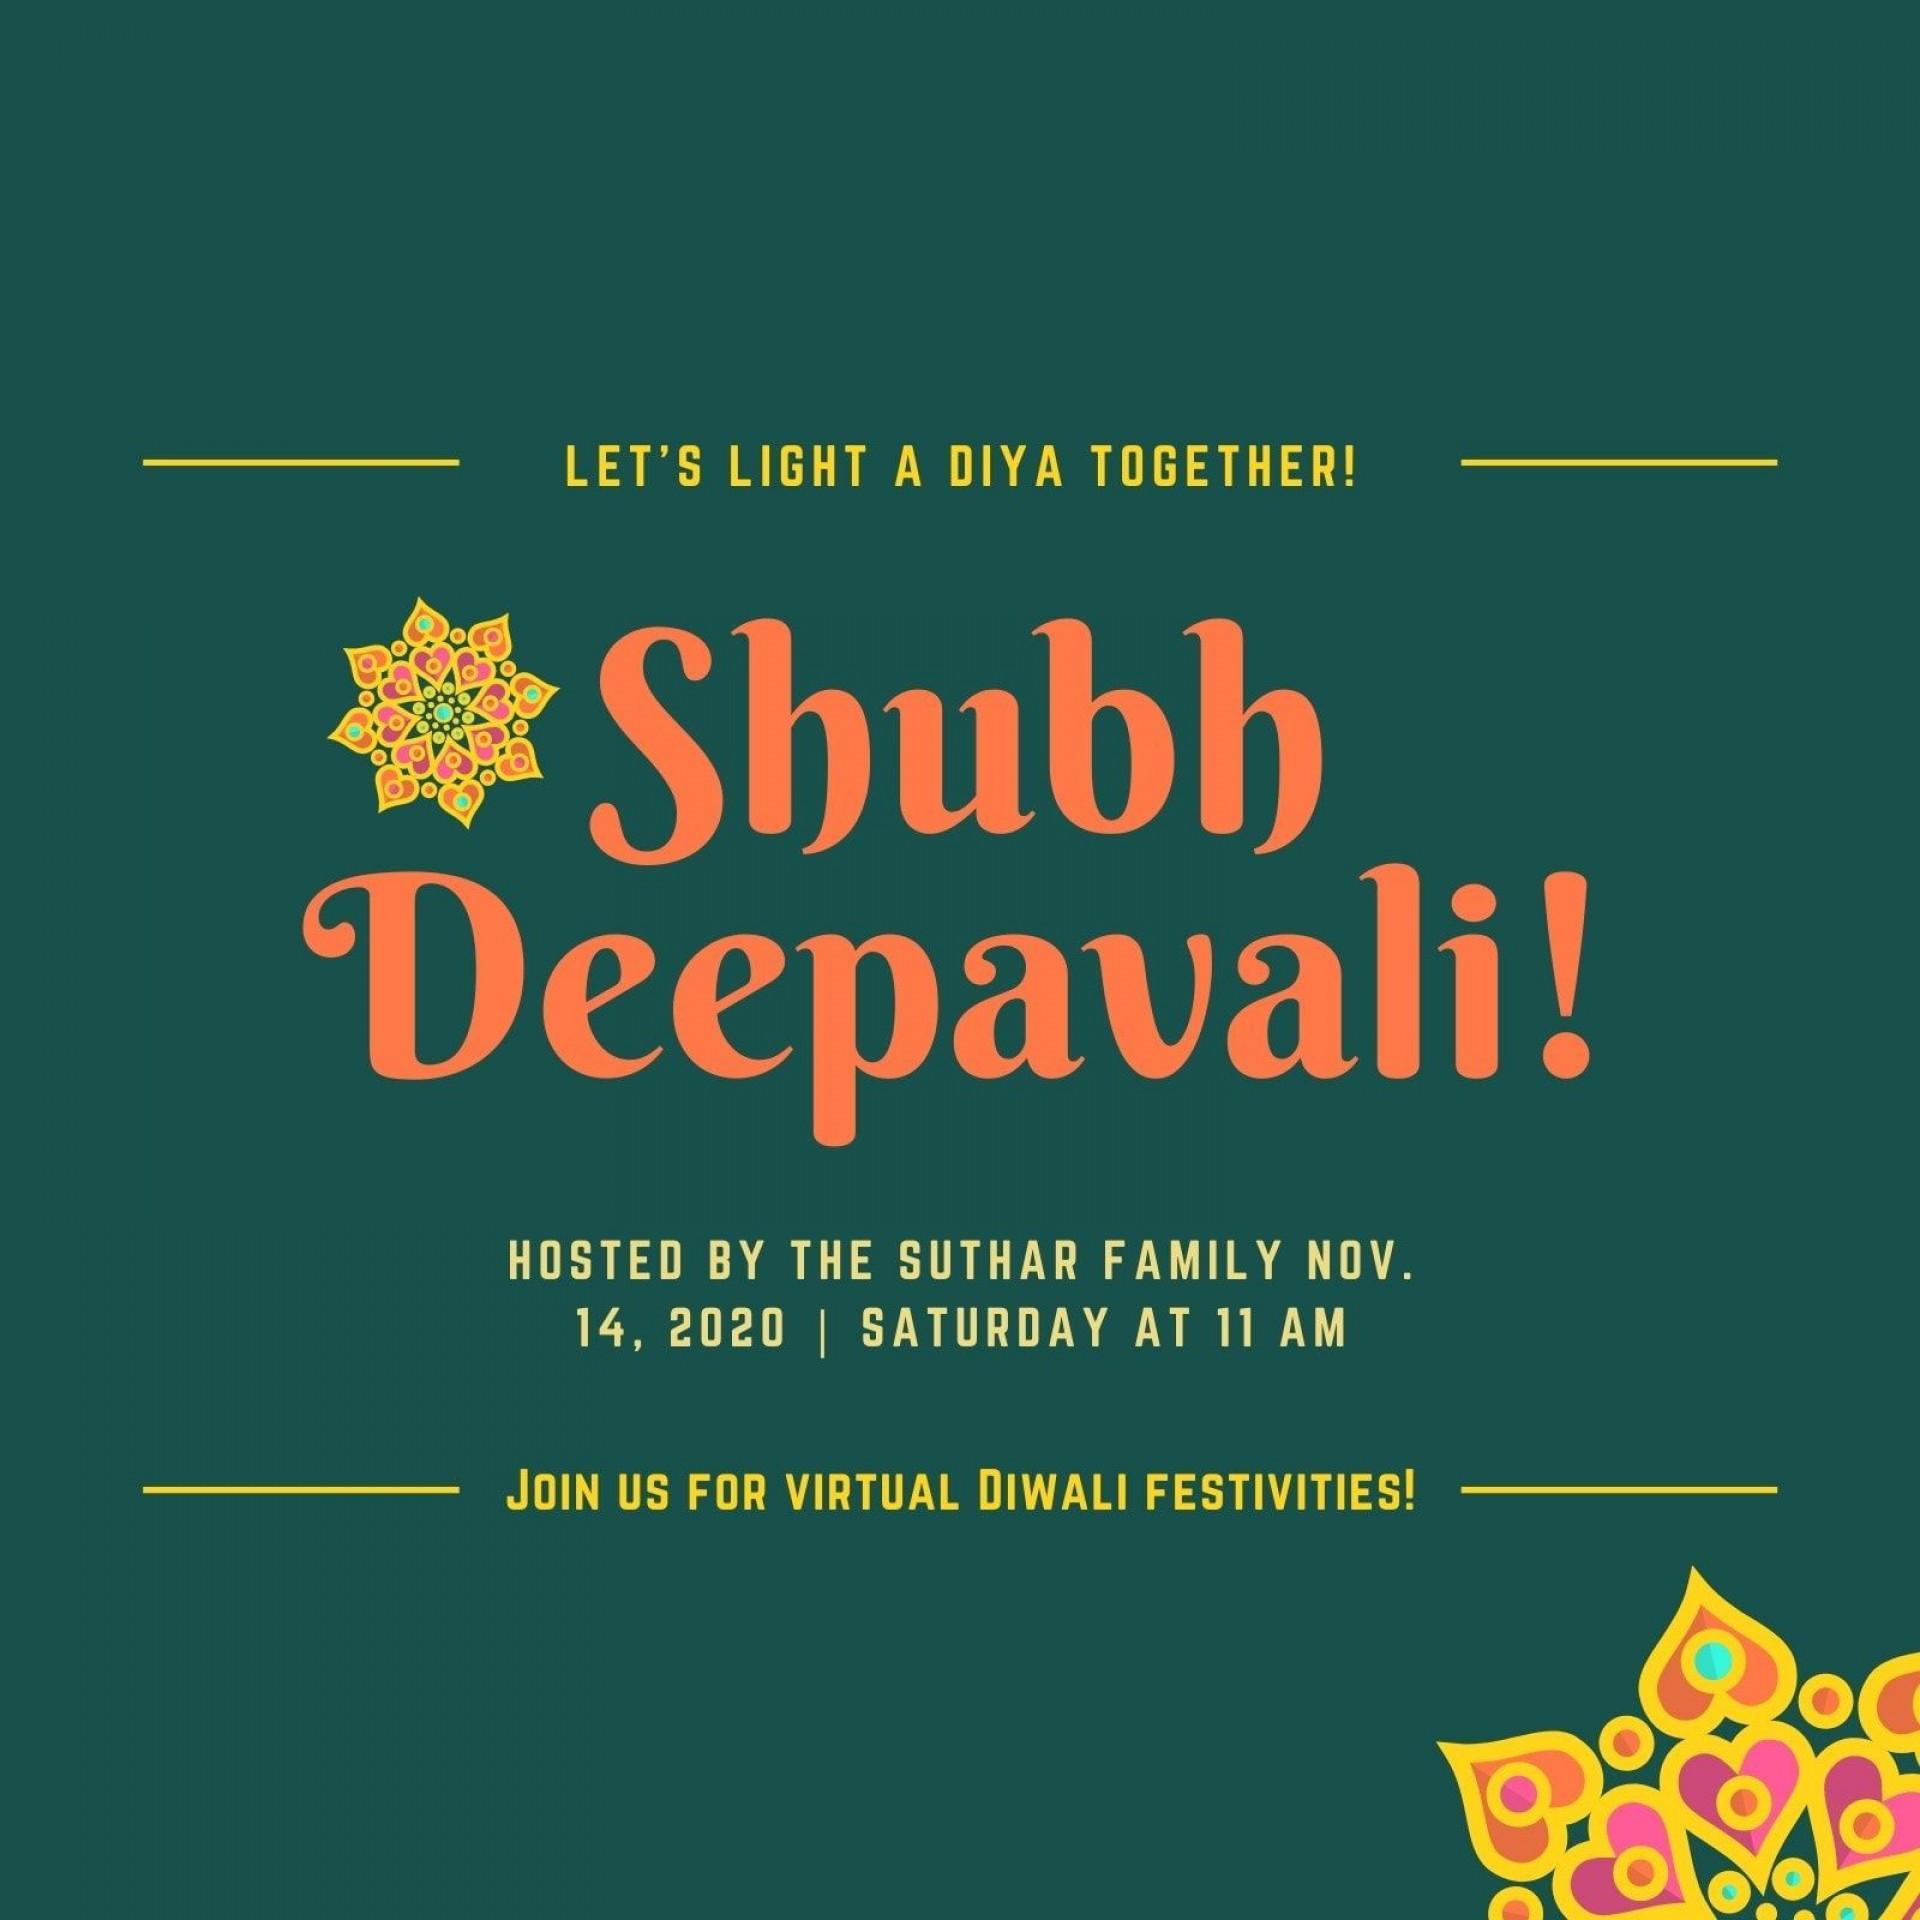 001 Wondrou Diwali Party Invite Template Free High Def 1920